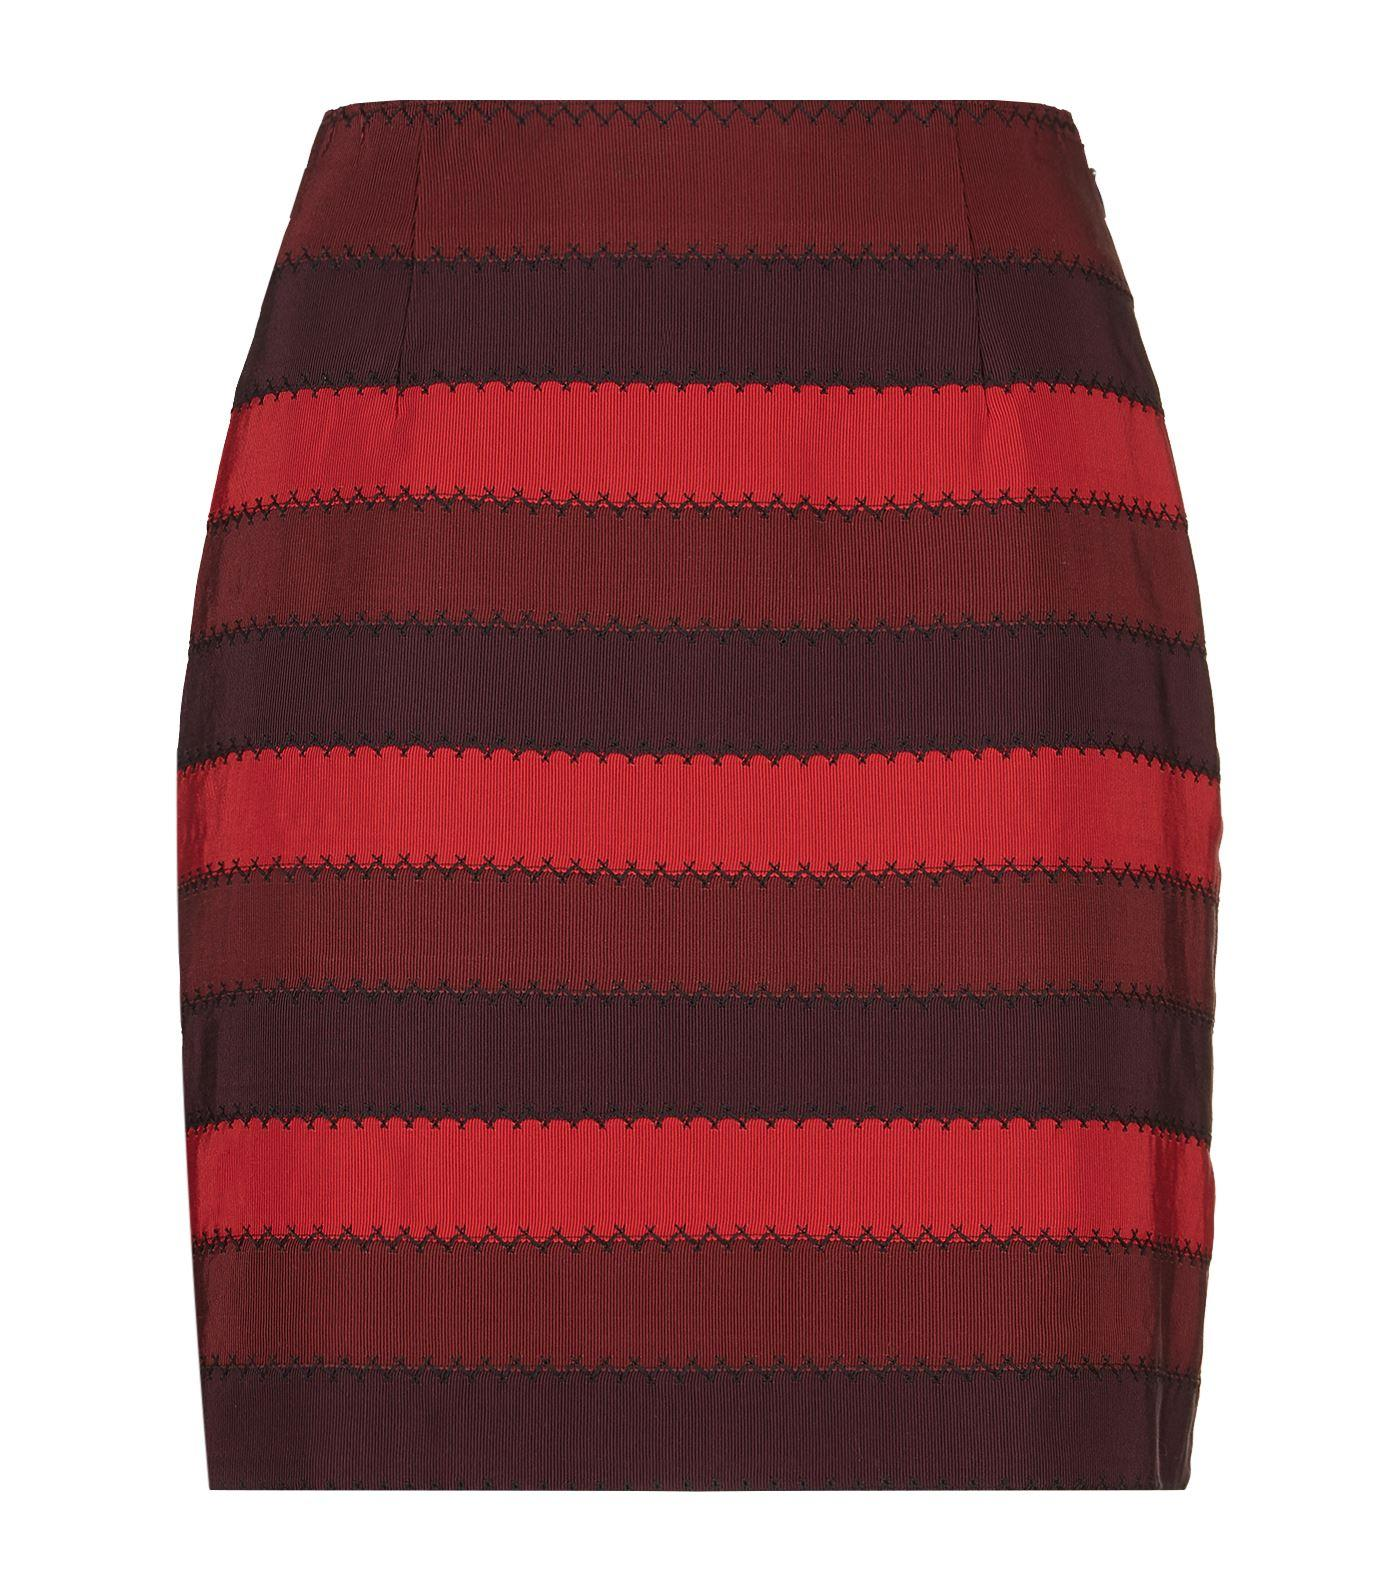 Mary katrantzou Clovis Mini Skirt in Red